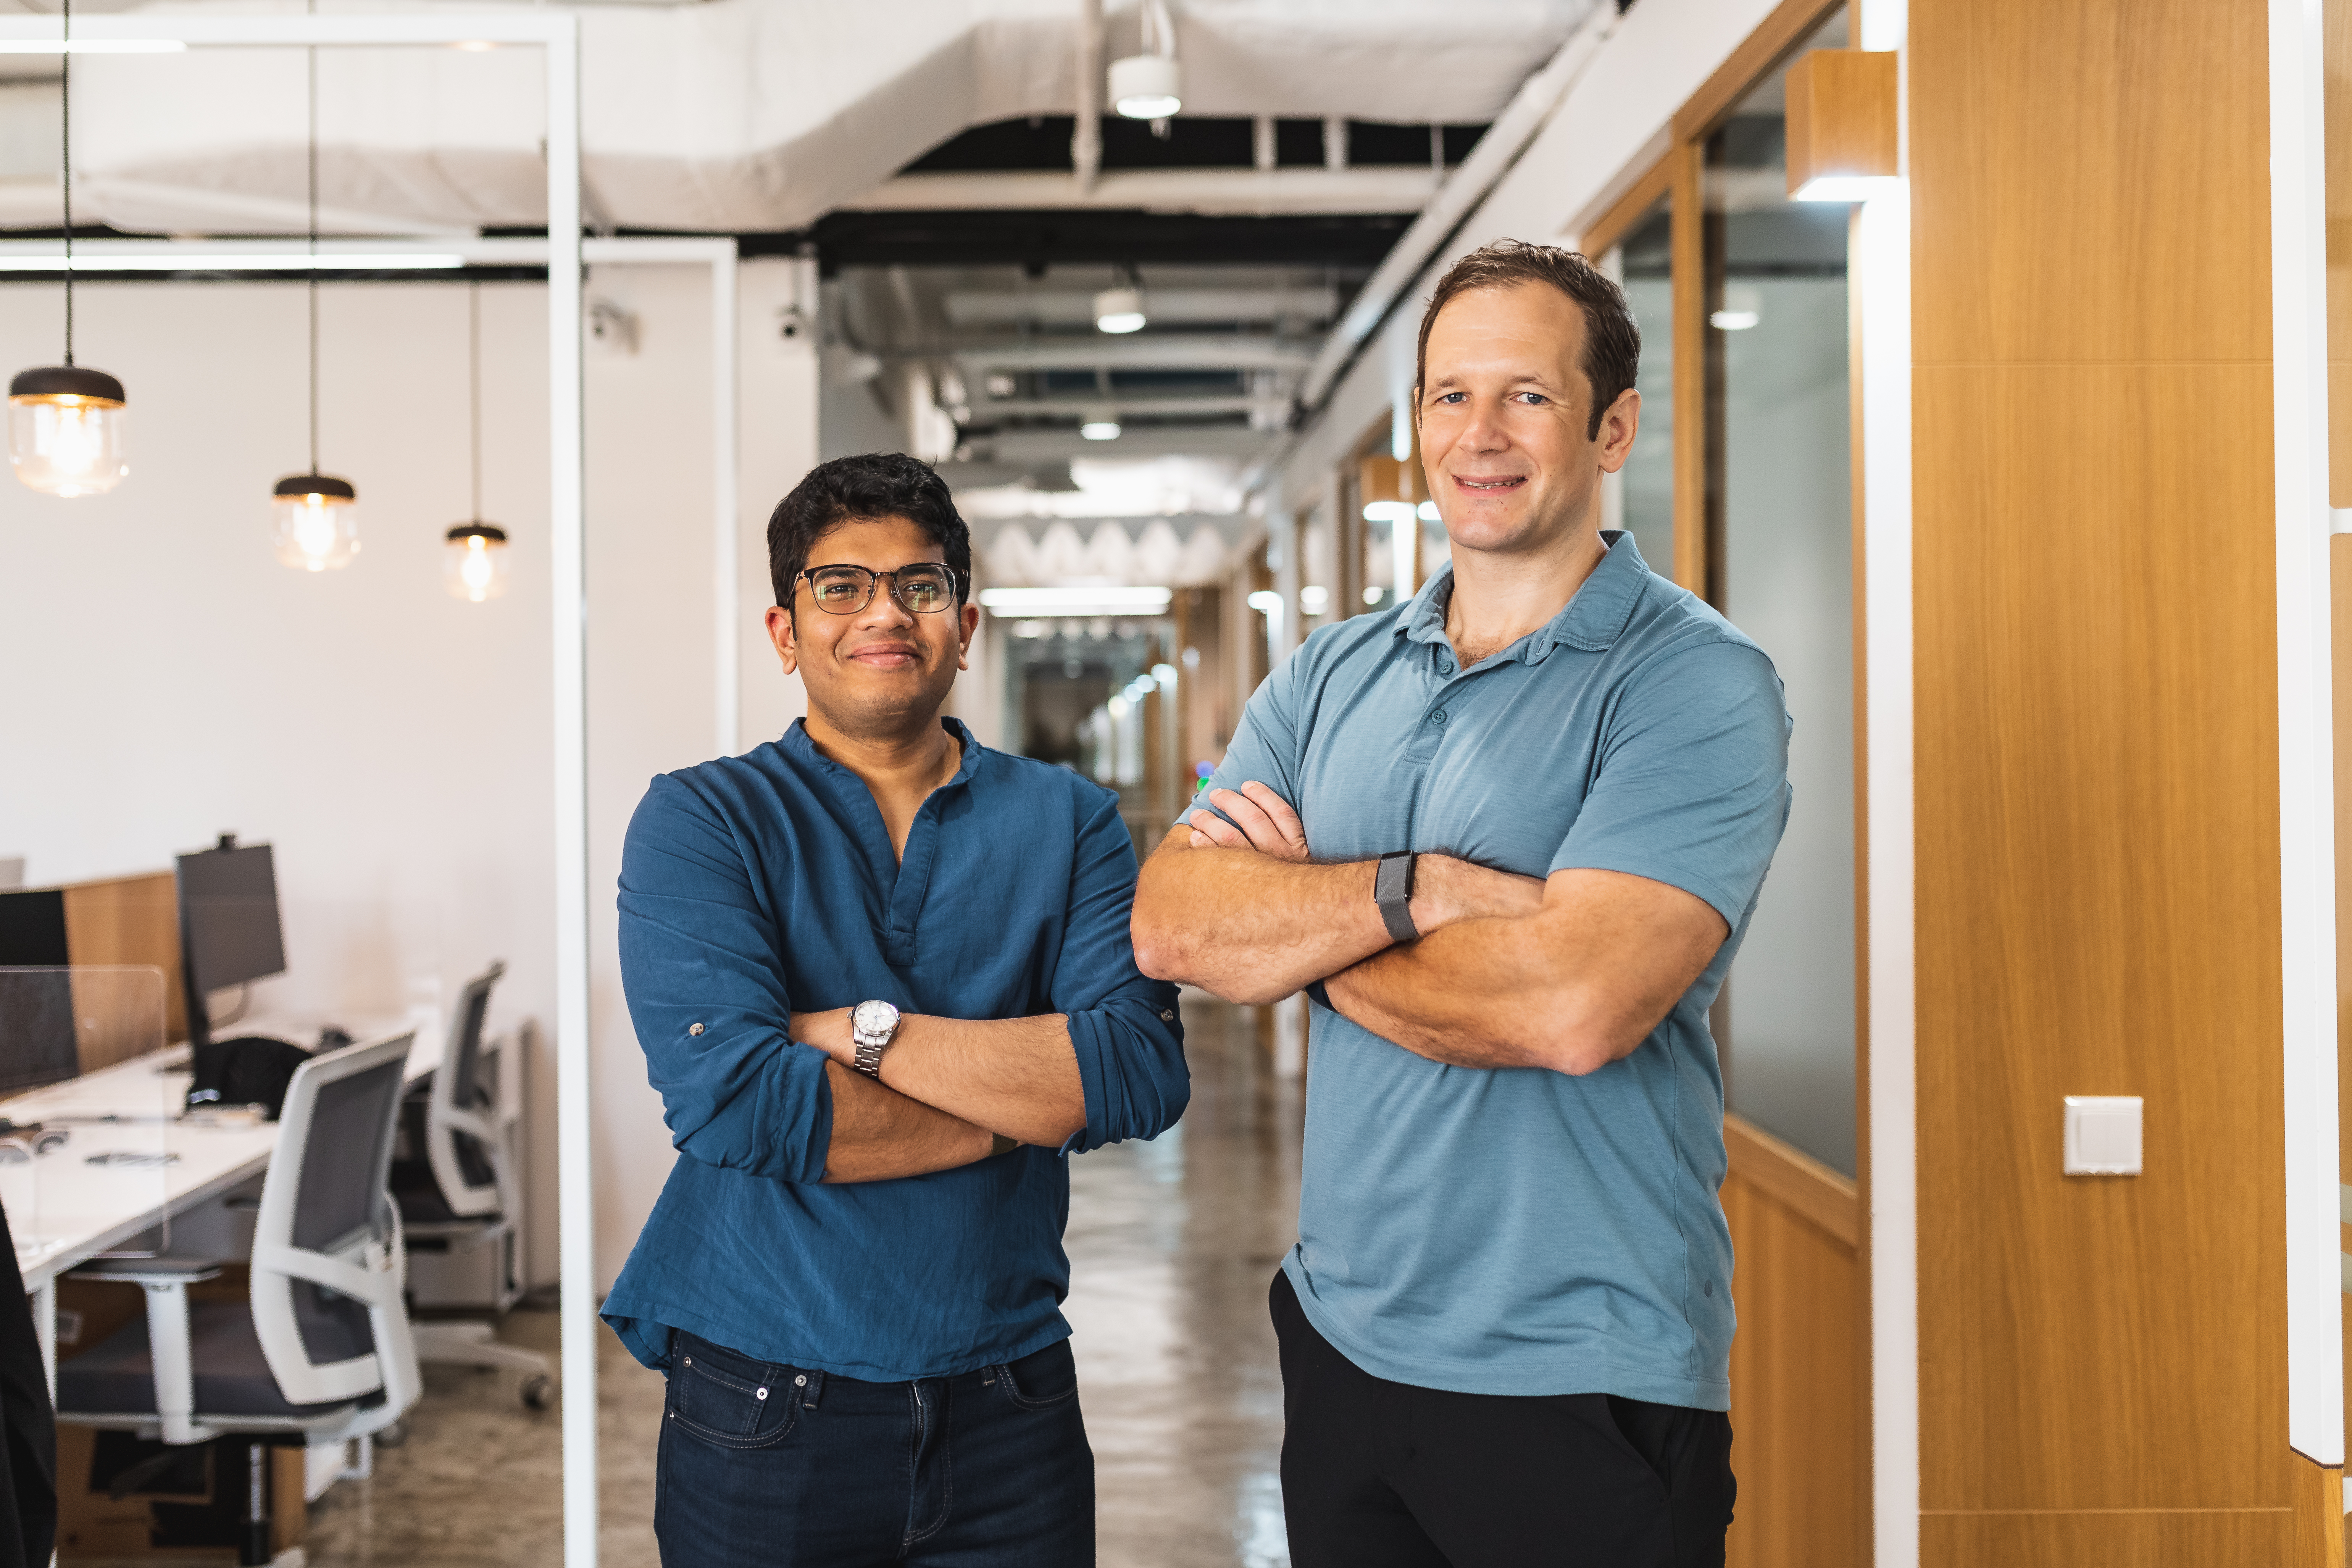 Greywing founders Nick Clarke and Hrishi Olickel